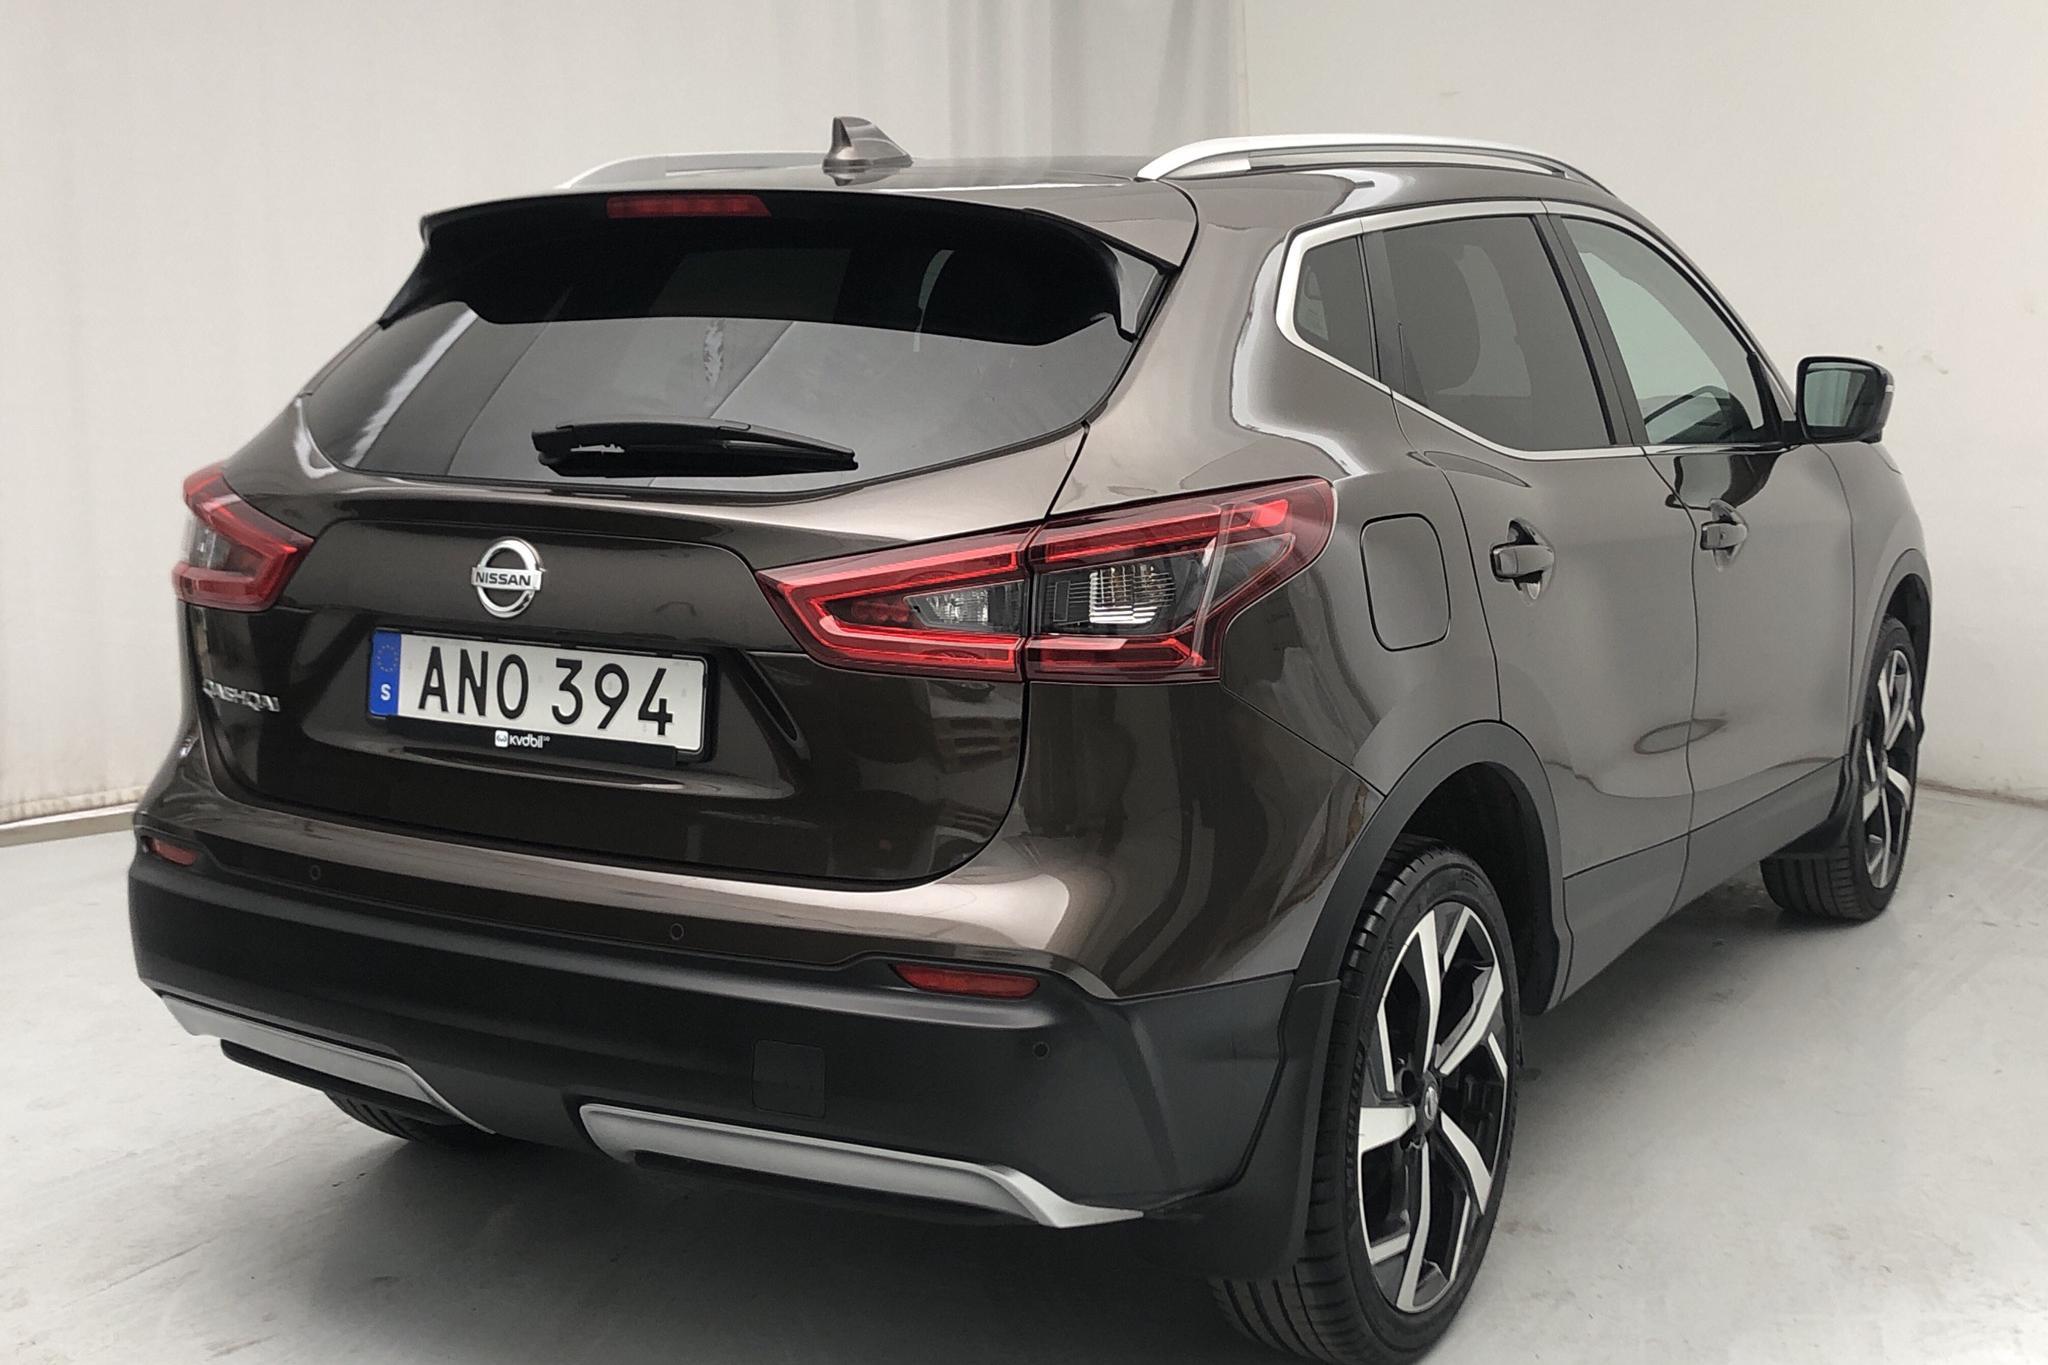 Nissan Qashqai 1.5 dCi (110hk) - 38 790 km - Manual - brown - 2018